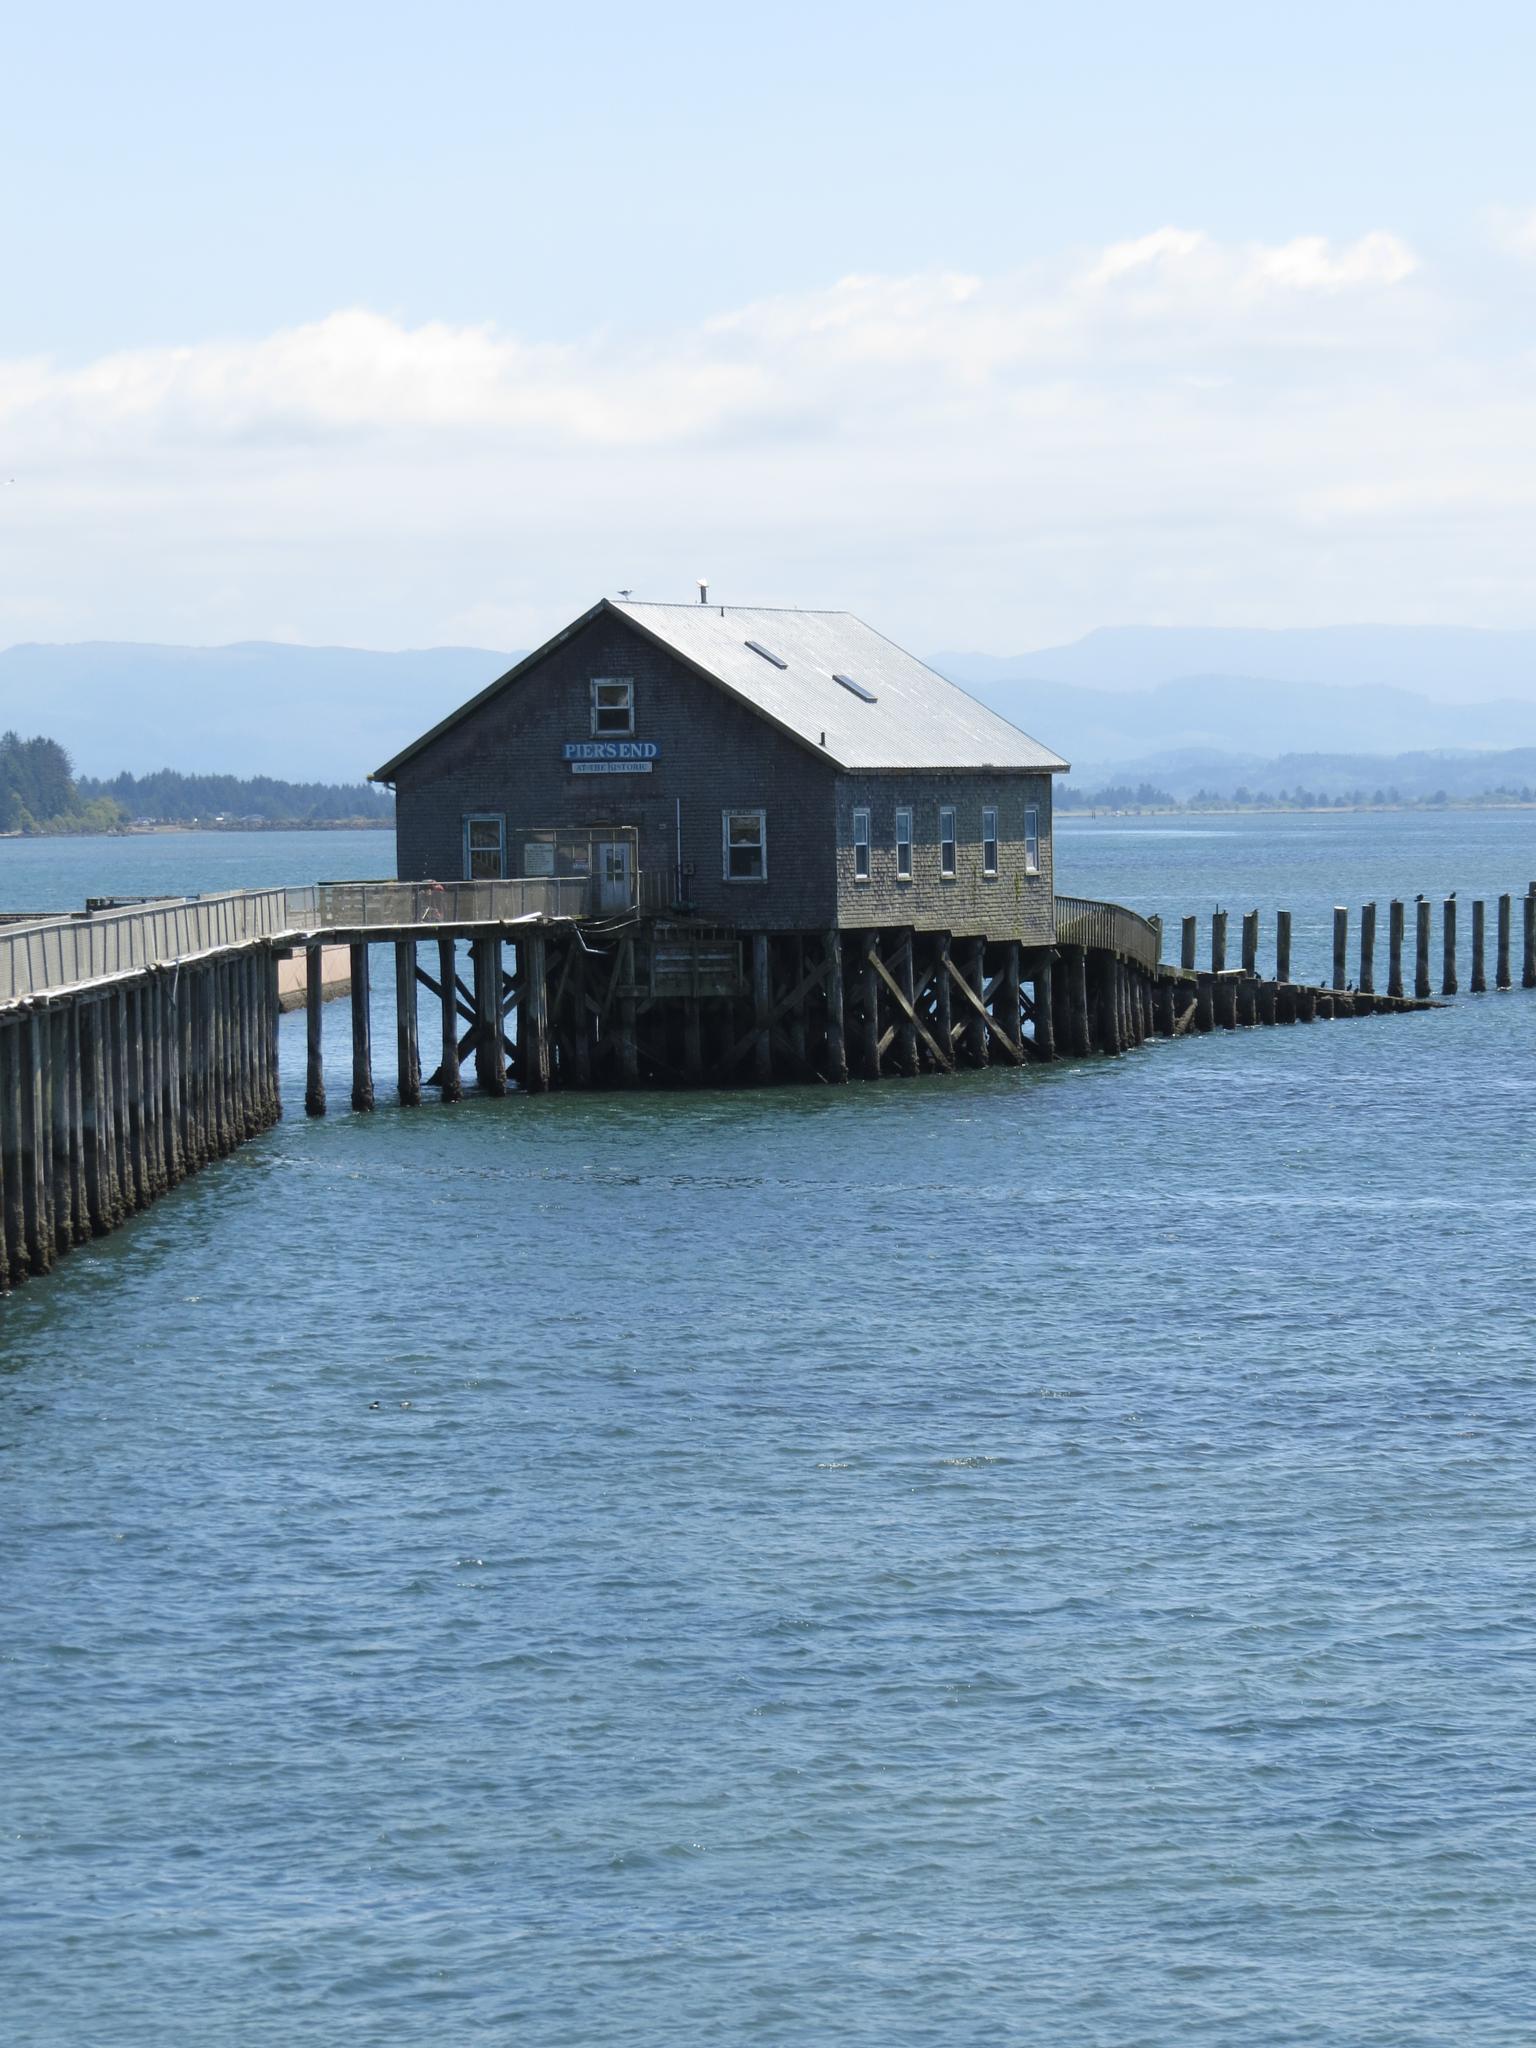 fishing docks by christine.rayburn.167